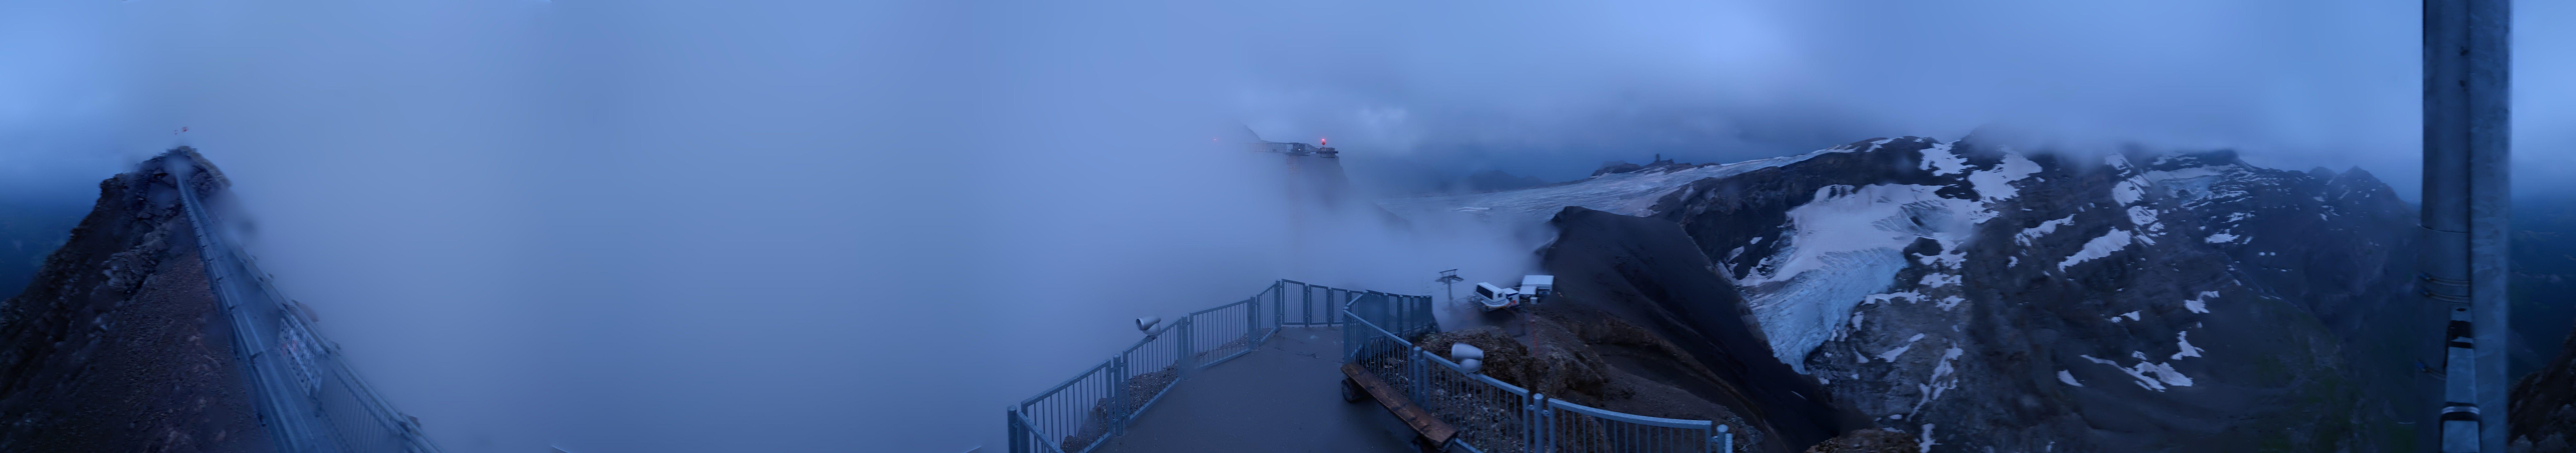 Ormont-Dessus: Glacier 3000 - Scex Rouge - Oldenhorn - Diablerets